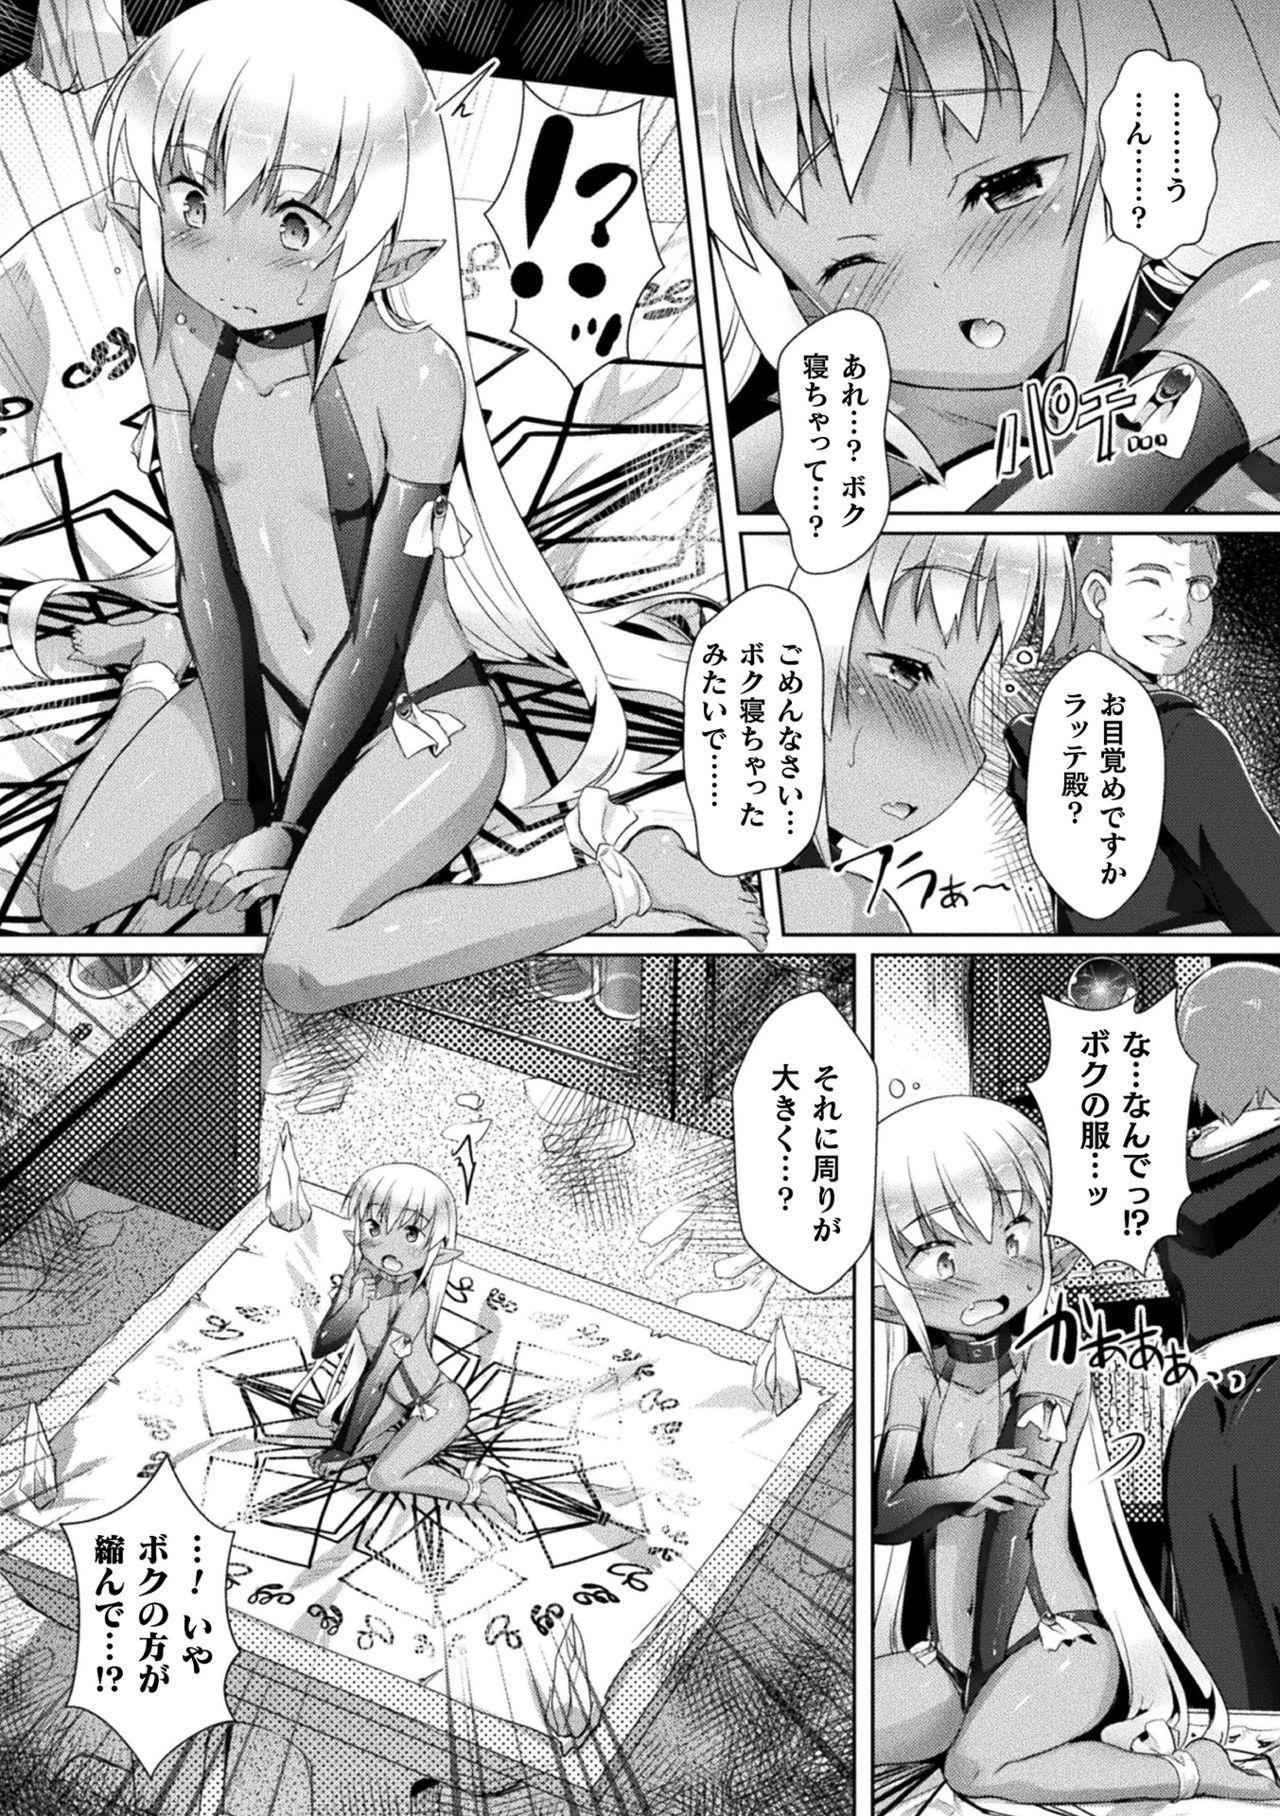 2D Comic Magazine - Syukusyouka Hiroin Kyousei Onahole Keikaku Vol. 2 22